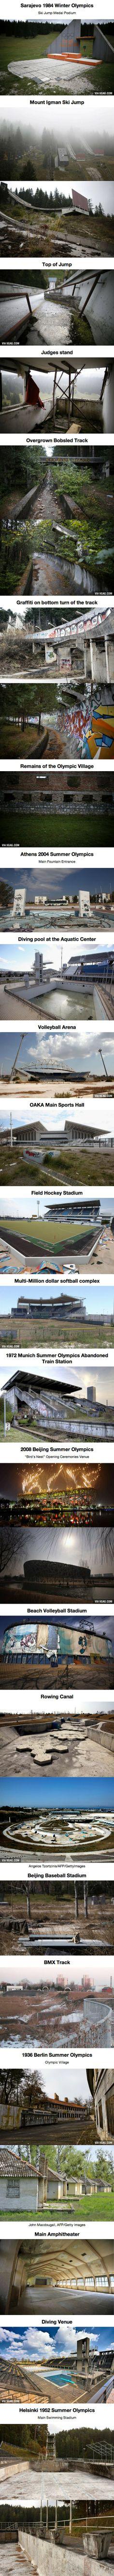 Haunting Photos Of Abandoned Olympic Stadiums